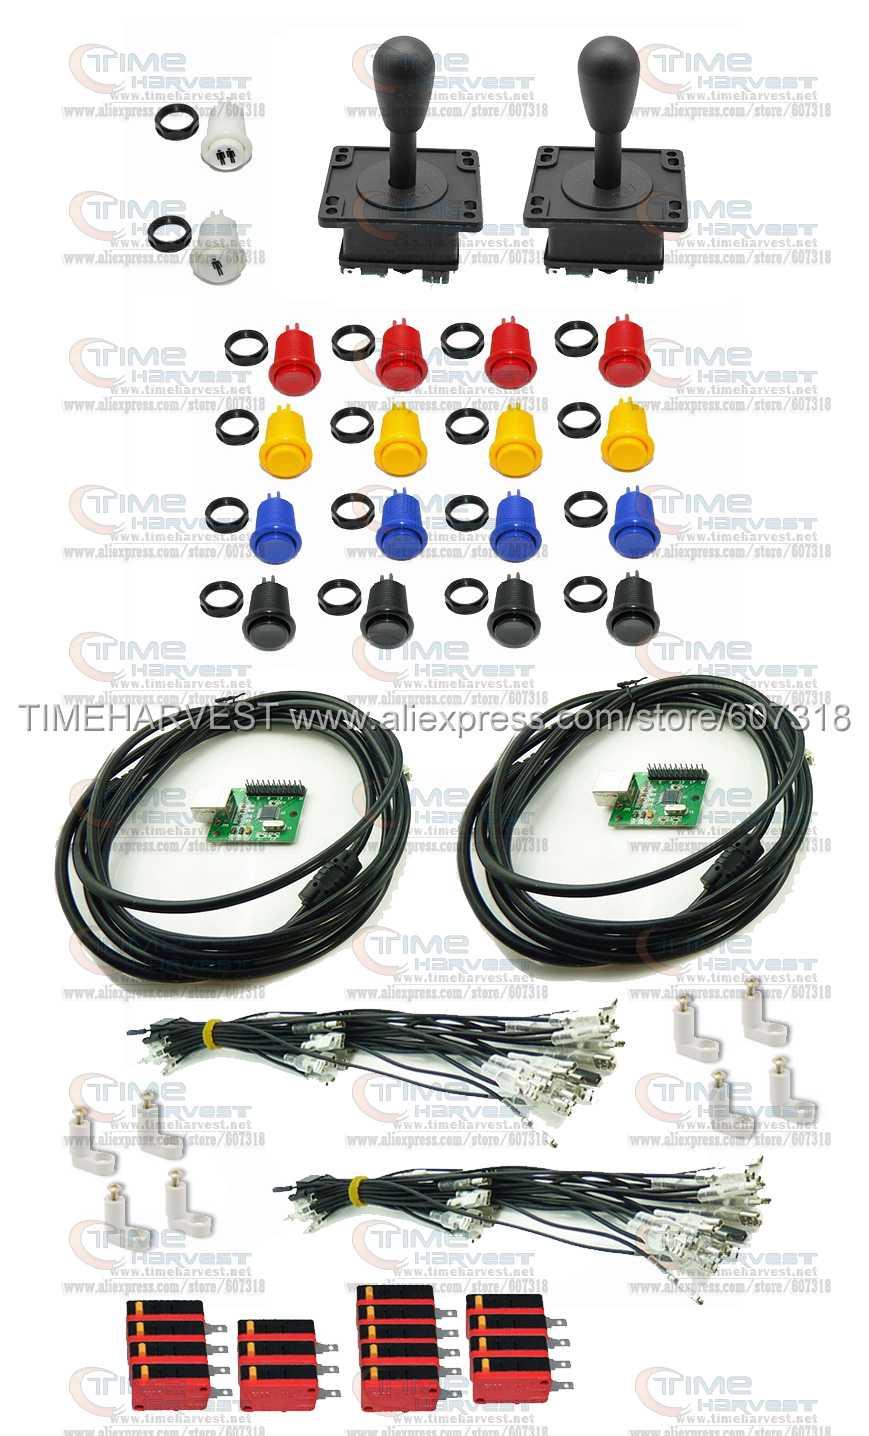 ФОТО Arcade parts Bundles kit With American Joystick buttons 2 x Zero Delay 1 player USB Encoder board Build Up Arcade Game Machine